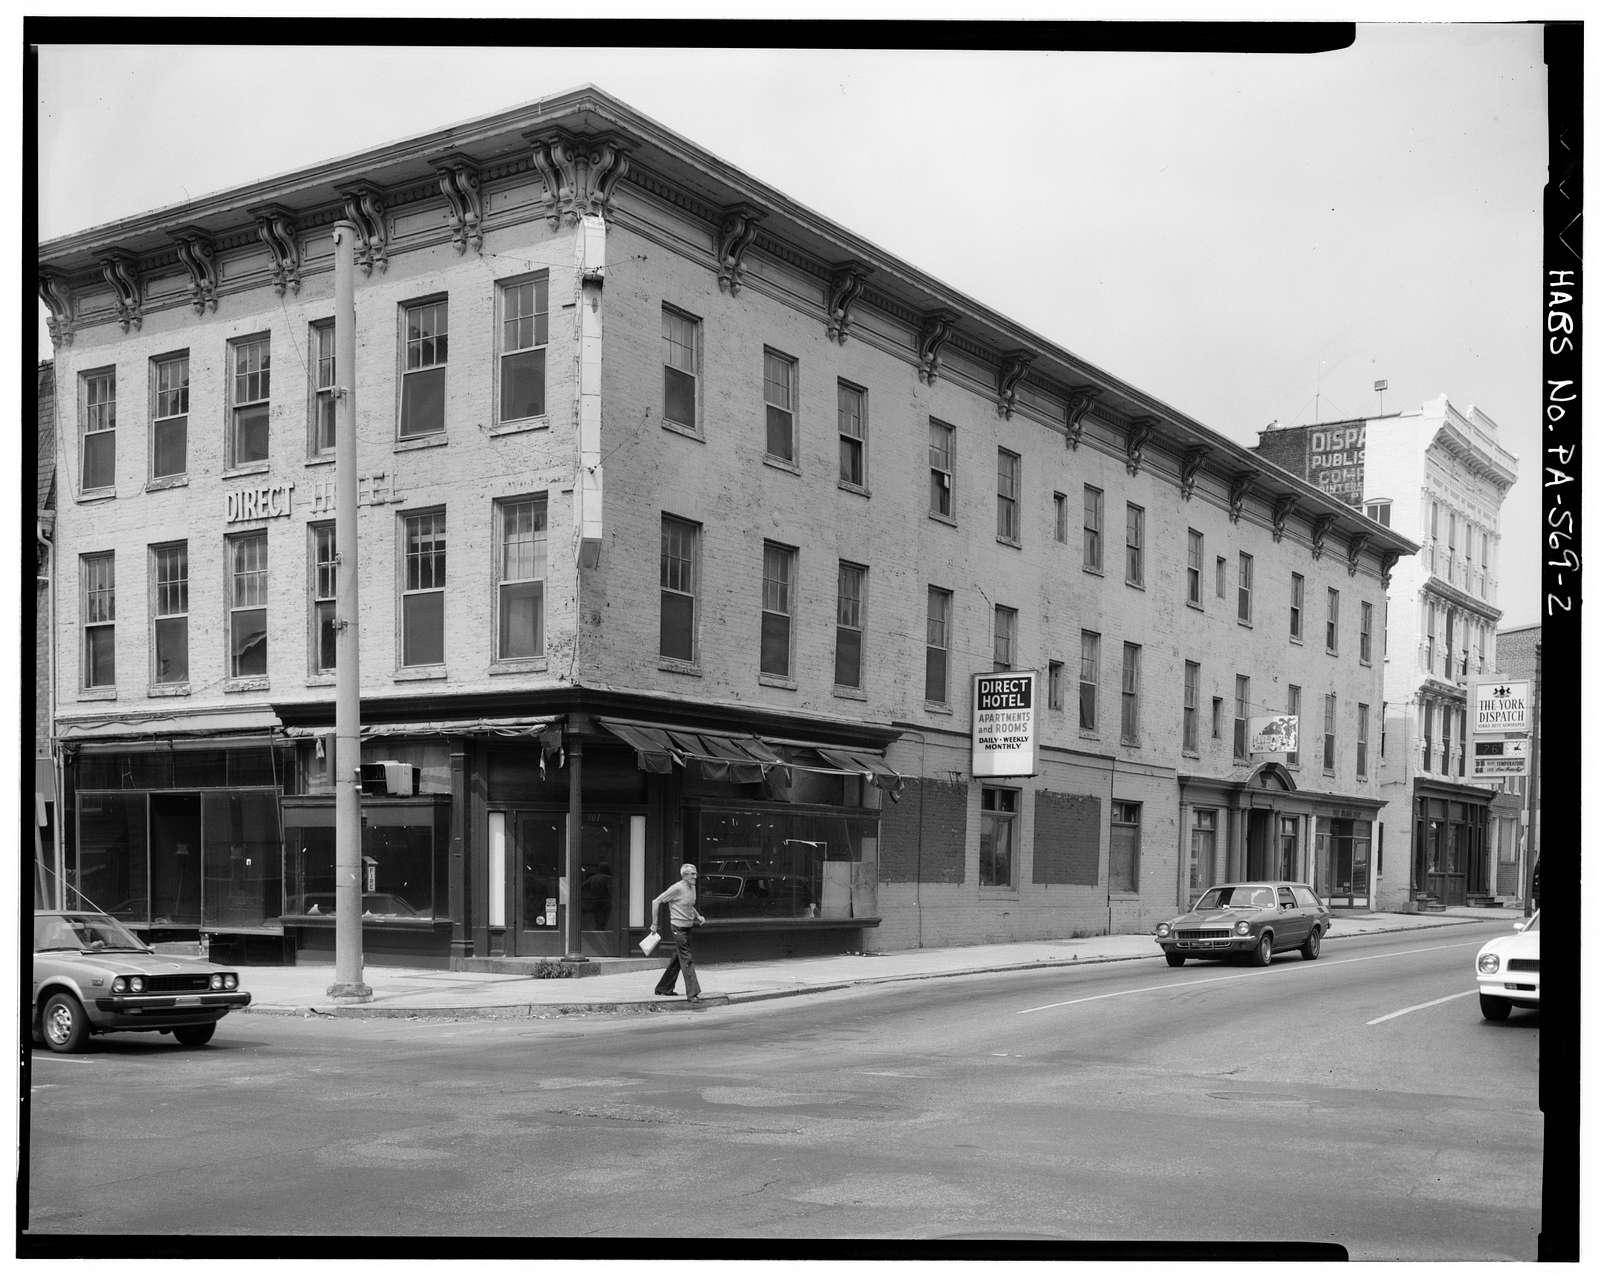 101-103 North George Street (Direct Hotel), York, York County, PA